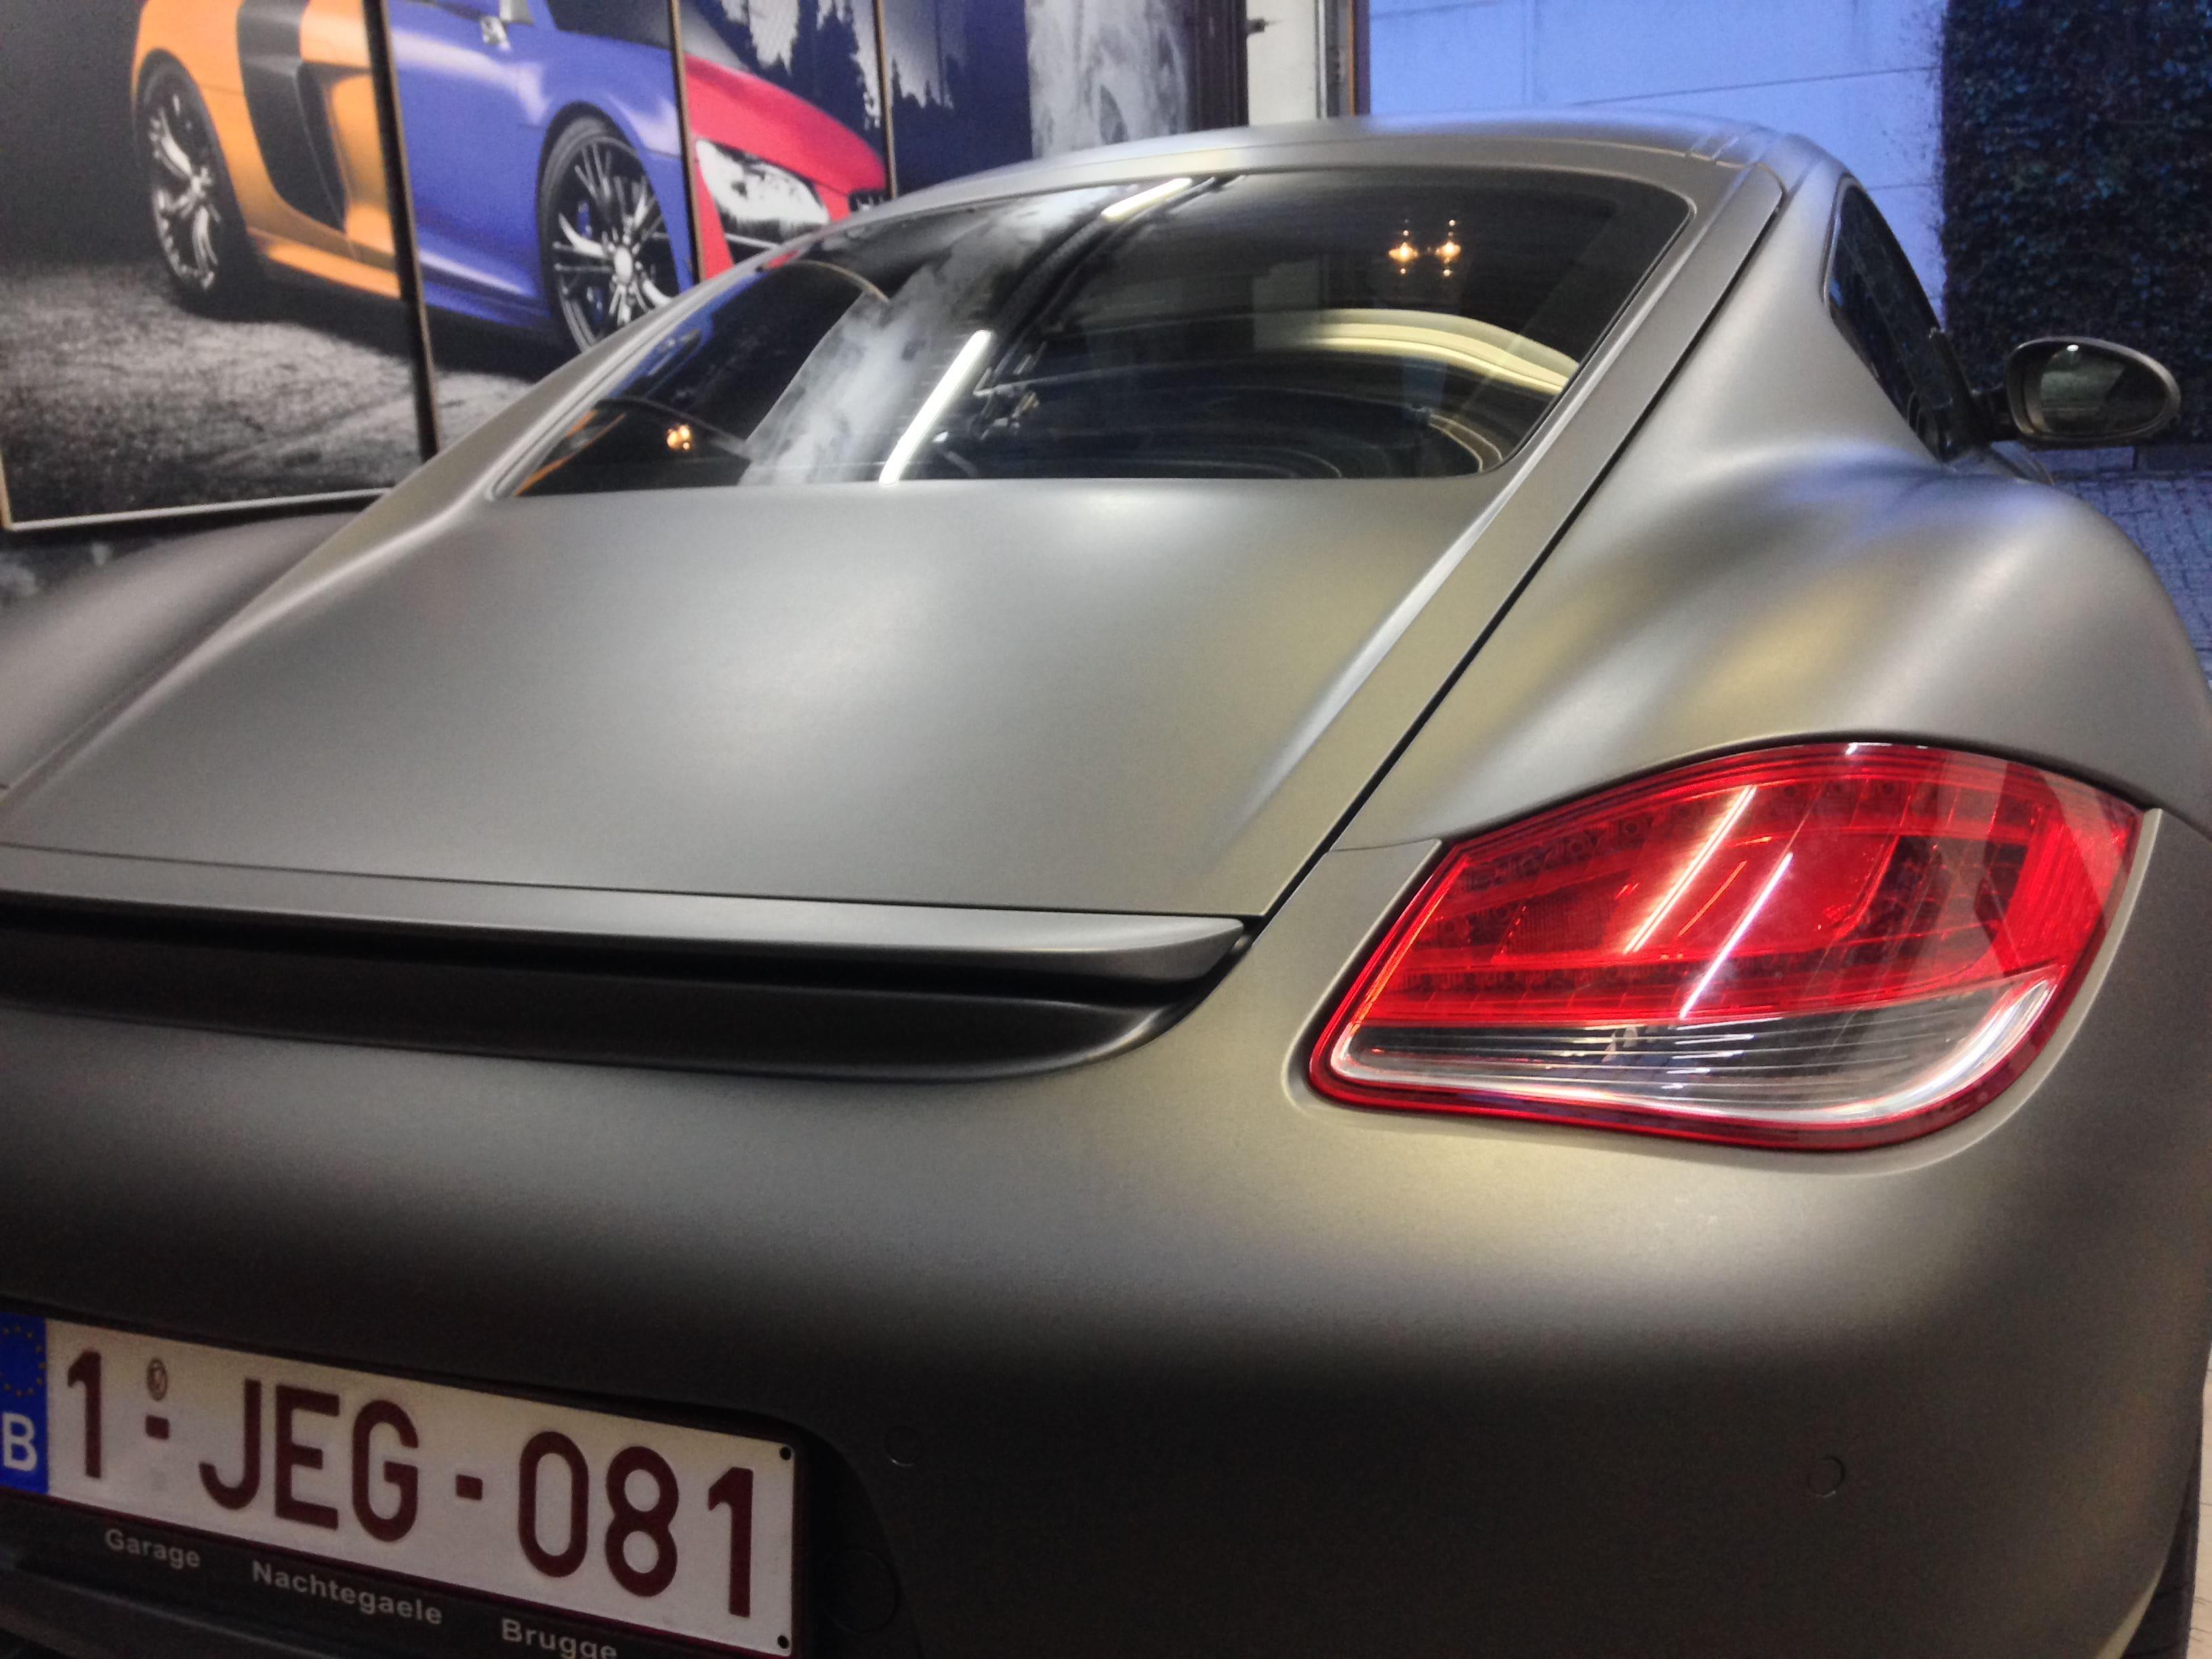 Porsche Cayman met Mat Charcoal Matte Wrap, Carwrapping door Wrapmyride.nu Foto-nr:7091, ©2021